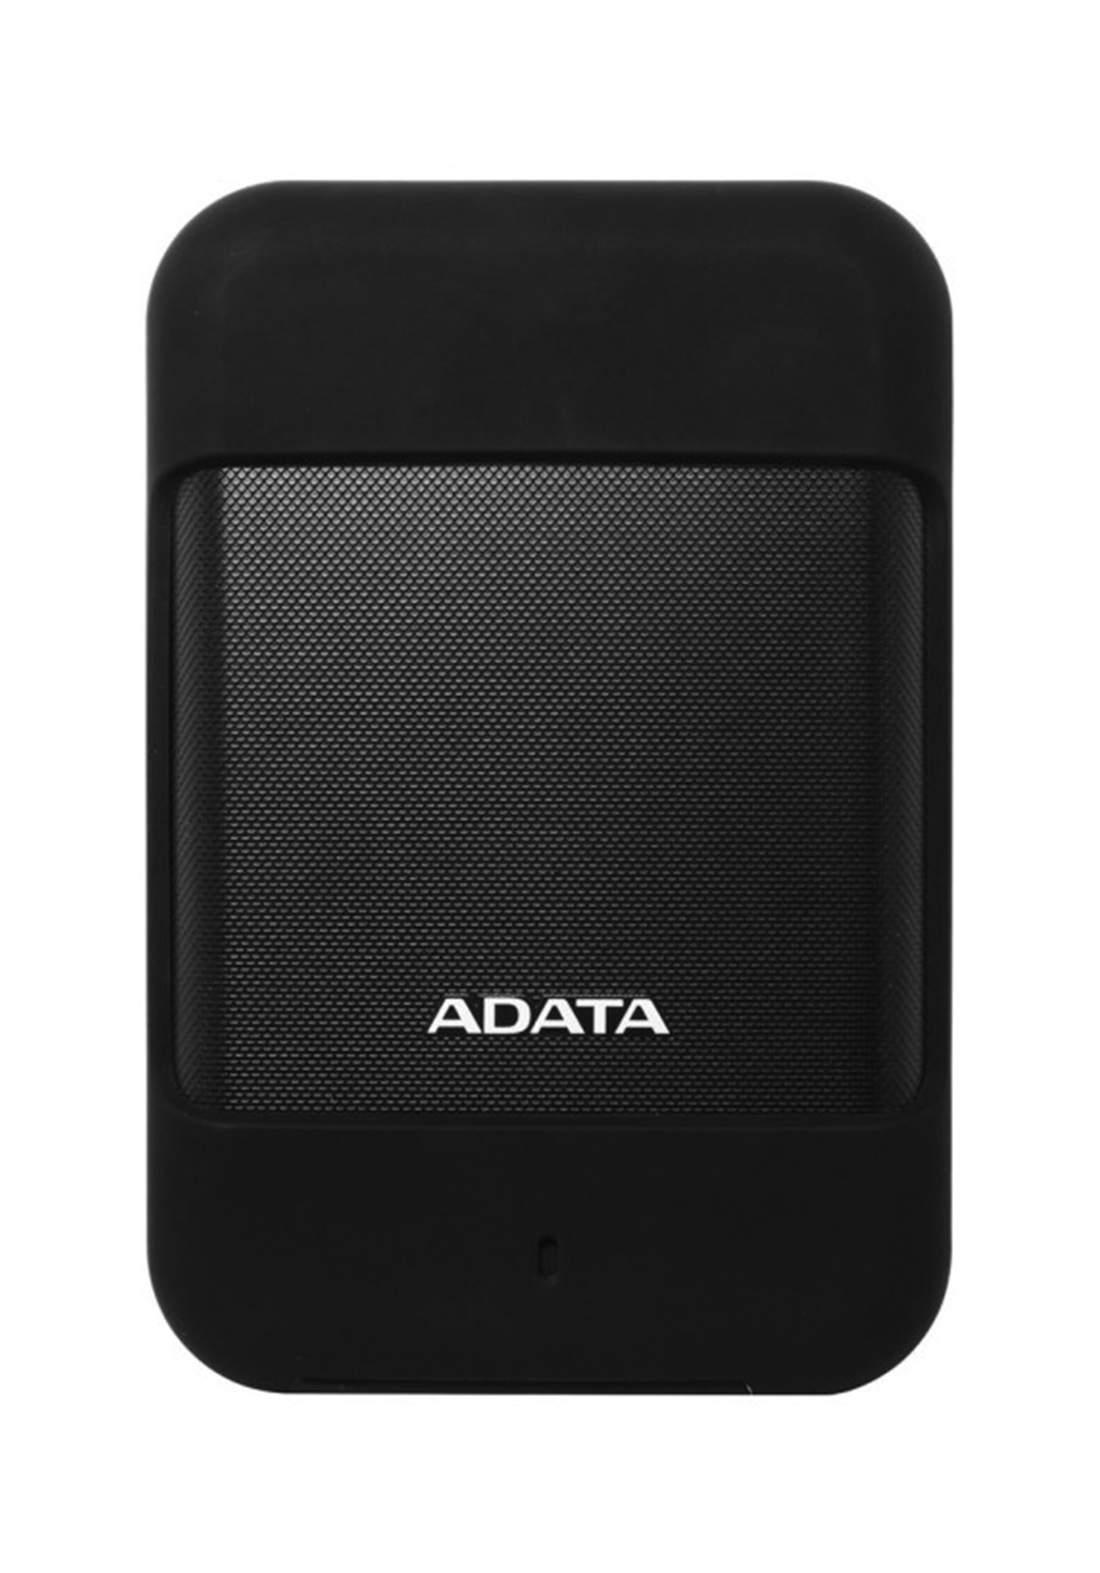 "ADATA HD700 2TB External Drive HDD USB 3.0 2.5"" - Black هارد خارجي"